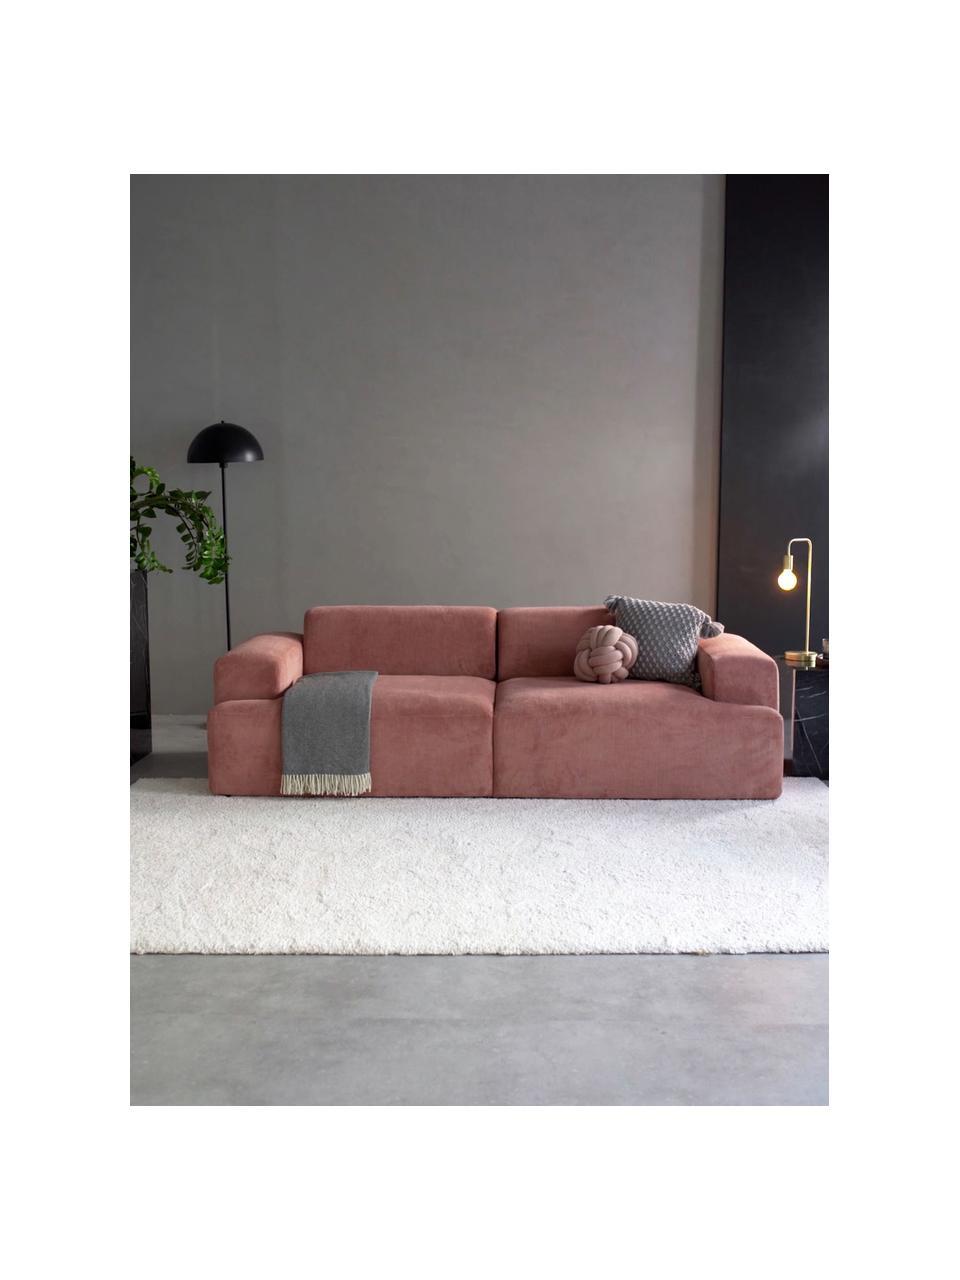 Cord-Sofa Melva (3-Sitzer) in Rosa, Bezug: Cord (92% Polyester, 8% P, Gestell: Massives Kiefernholz, FSC, Füße: Kunststoff, Cord Rosa, B 238 x T 101 cm